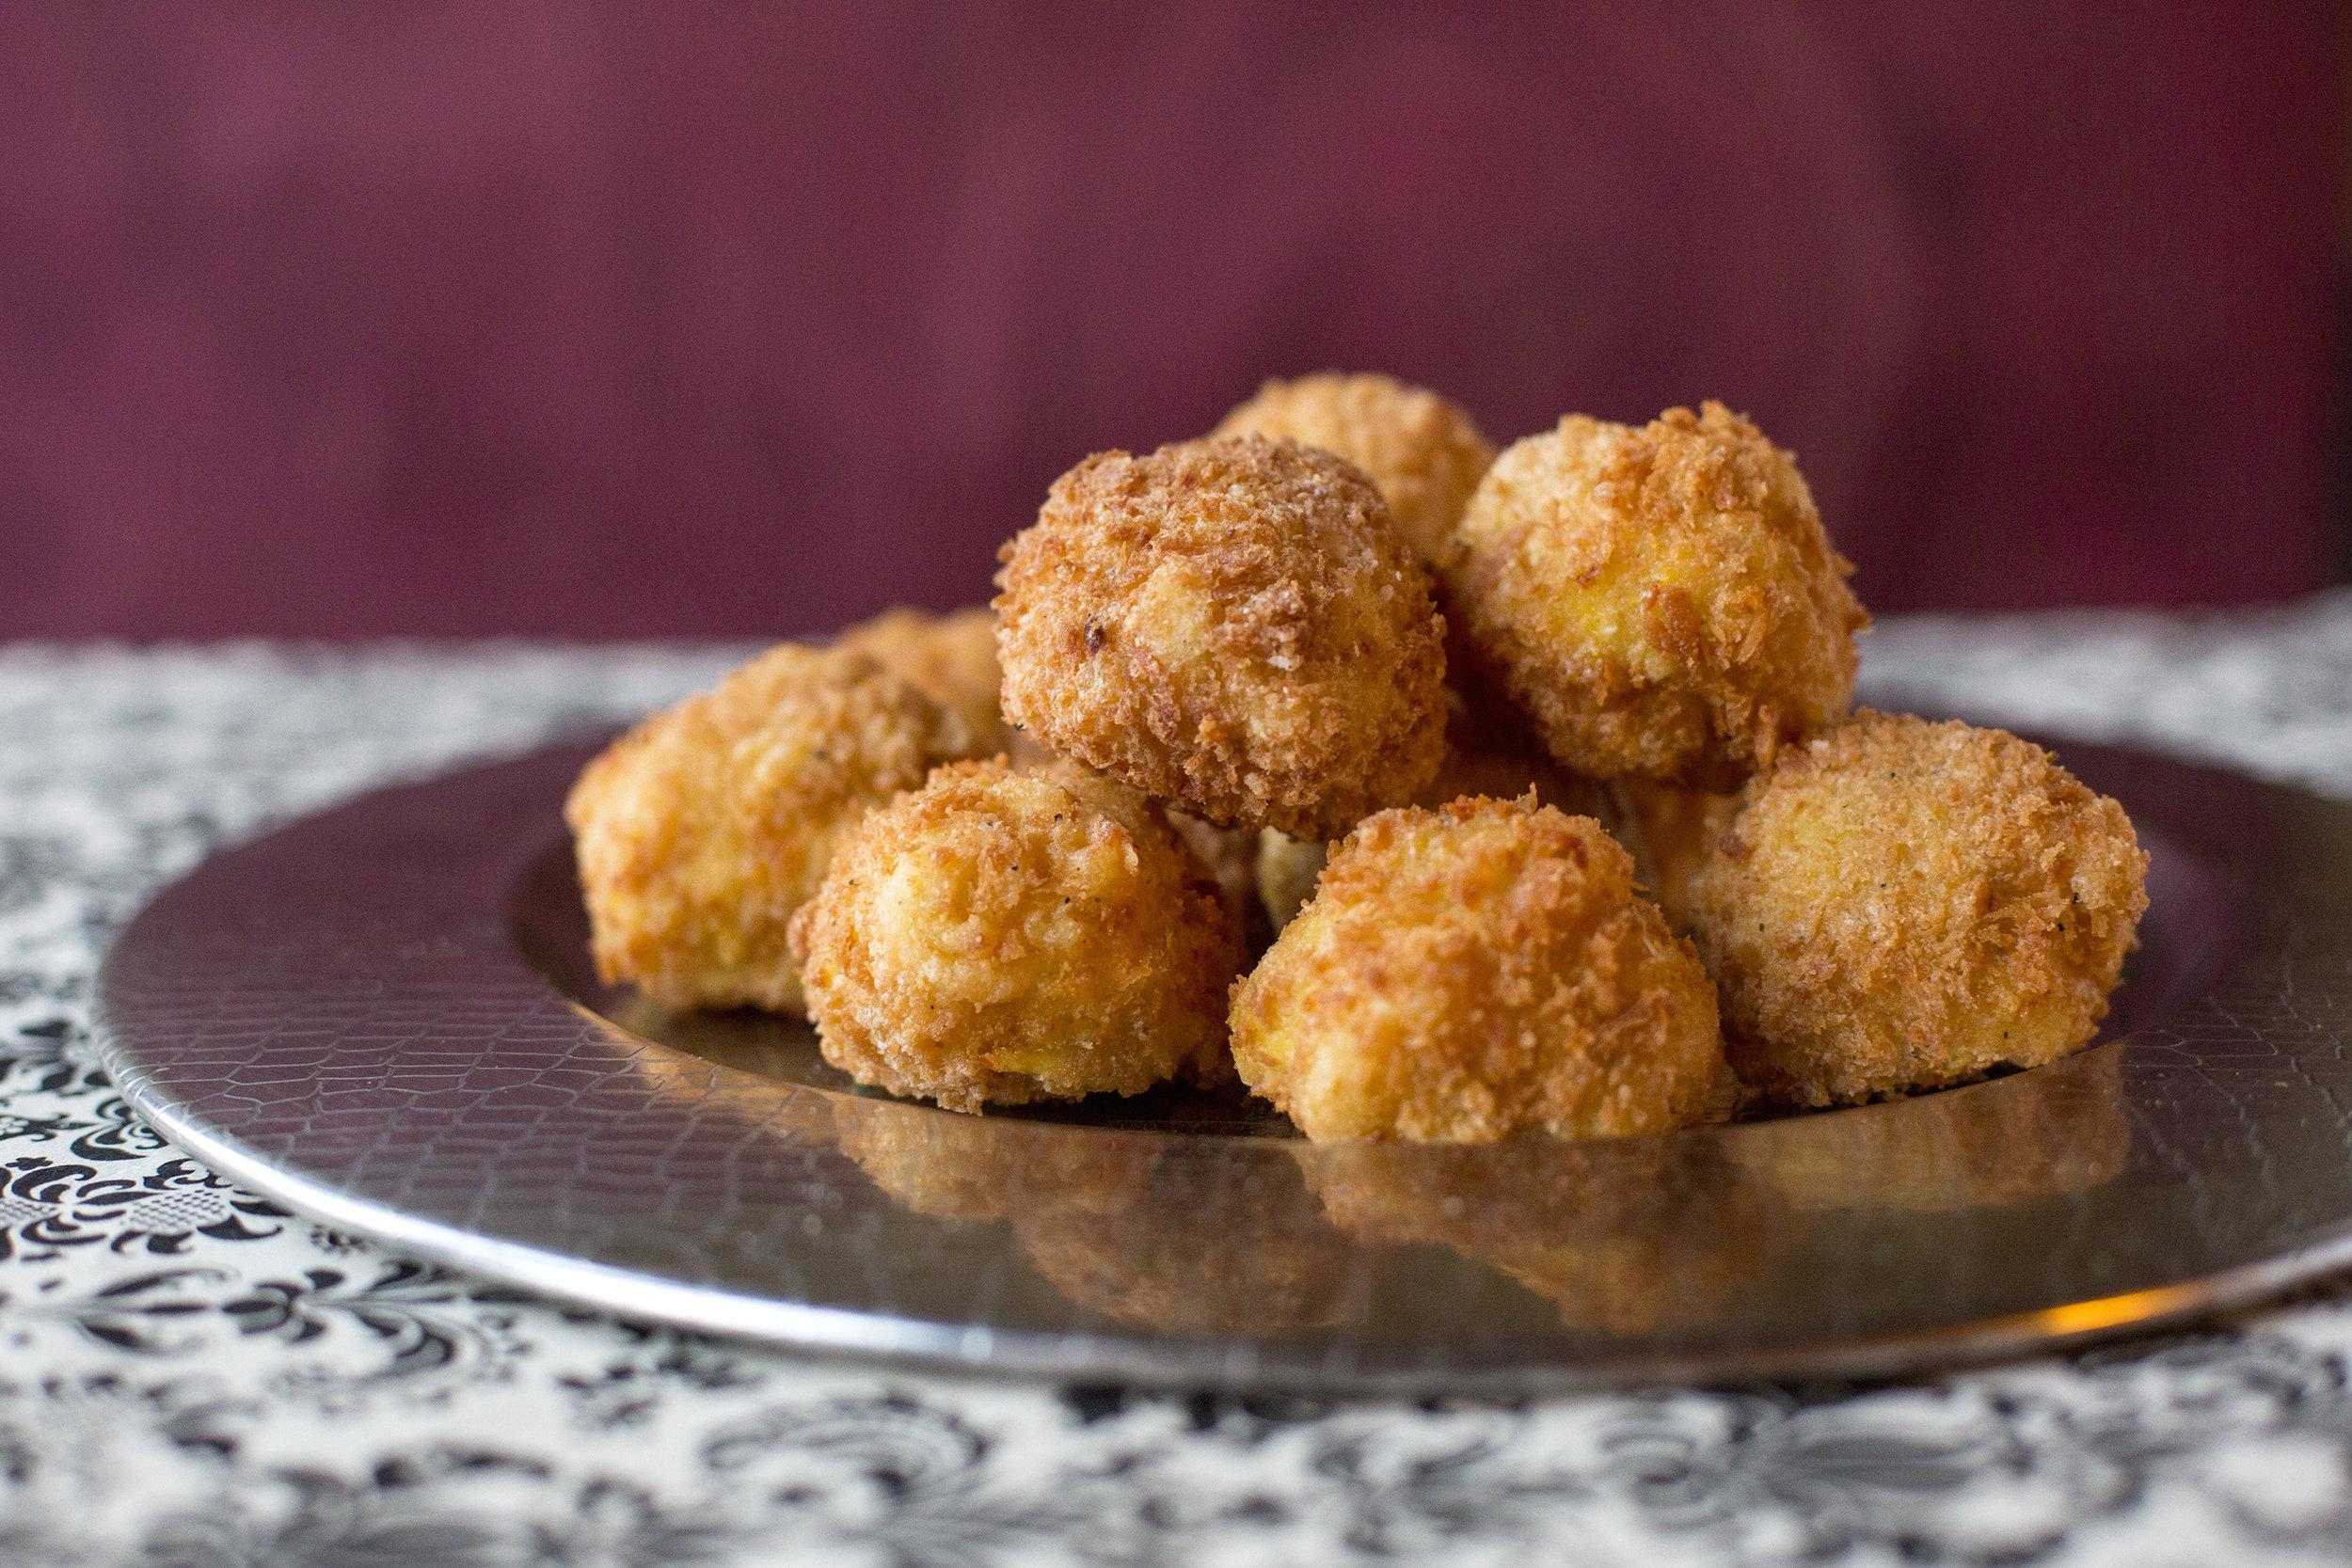 Artichoke Mac and Five Cheese bites